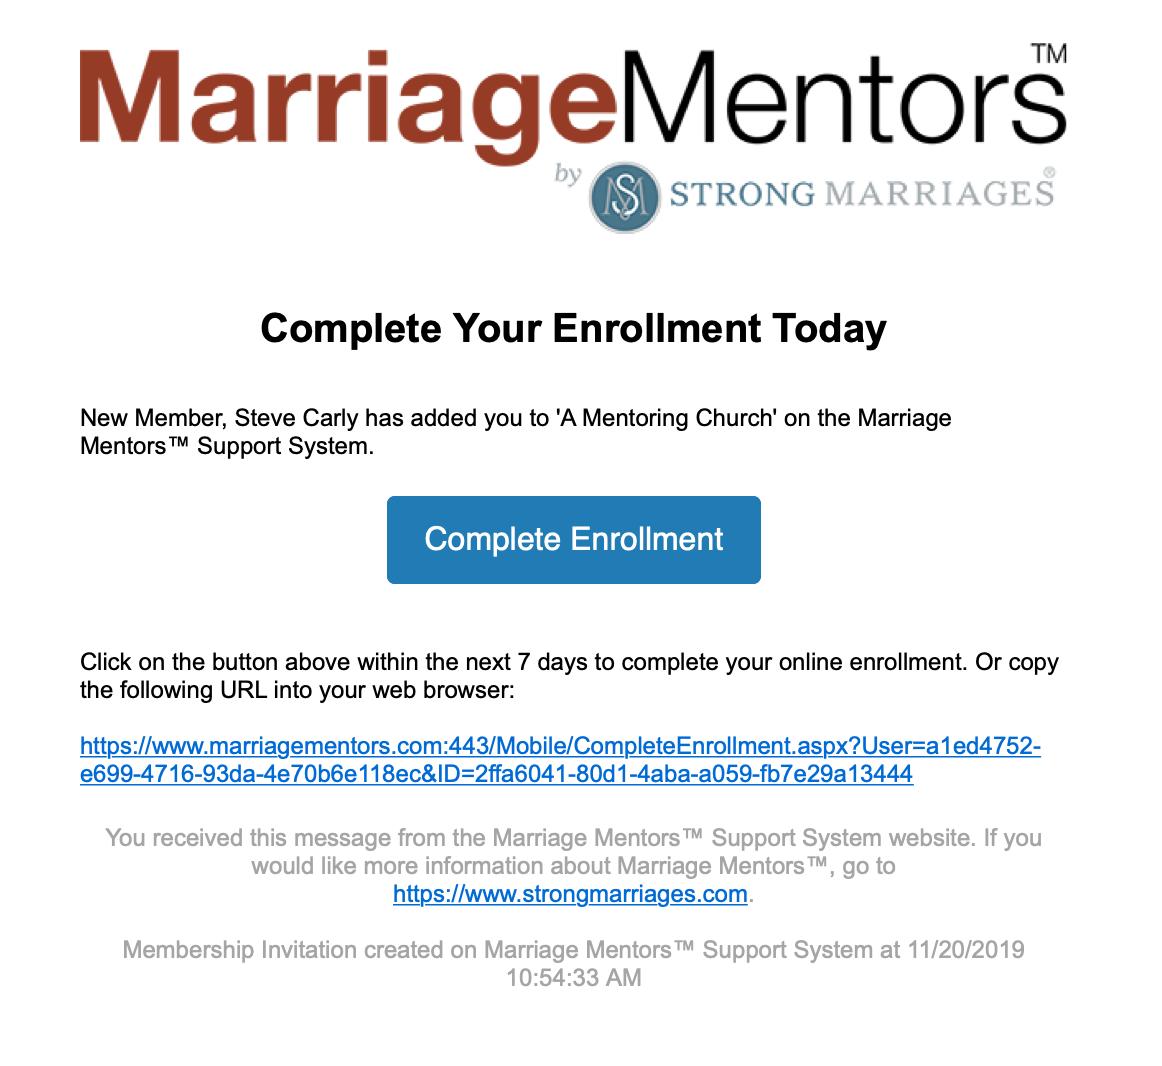 Complete Enrollment E-Mail